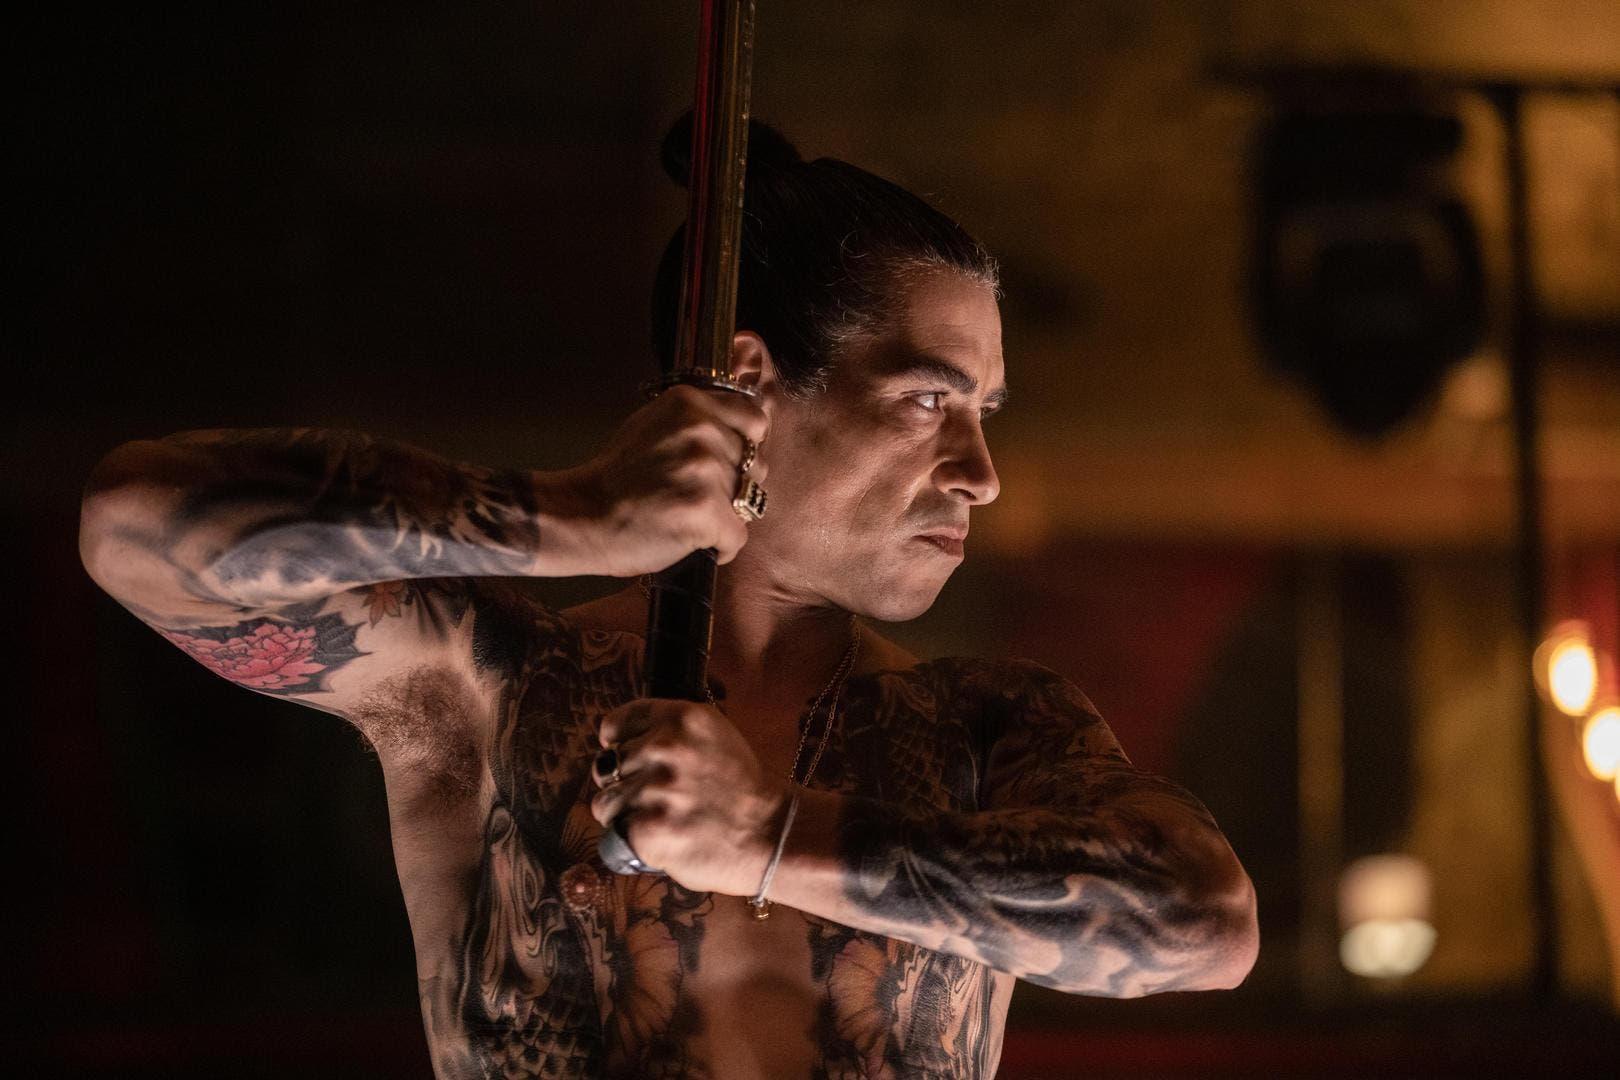 Xtremo: El John Wick a la española de Netflix que hay que reivindicar